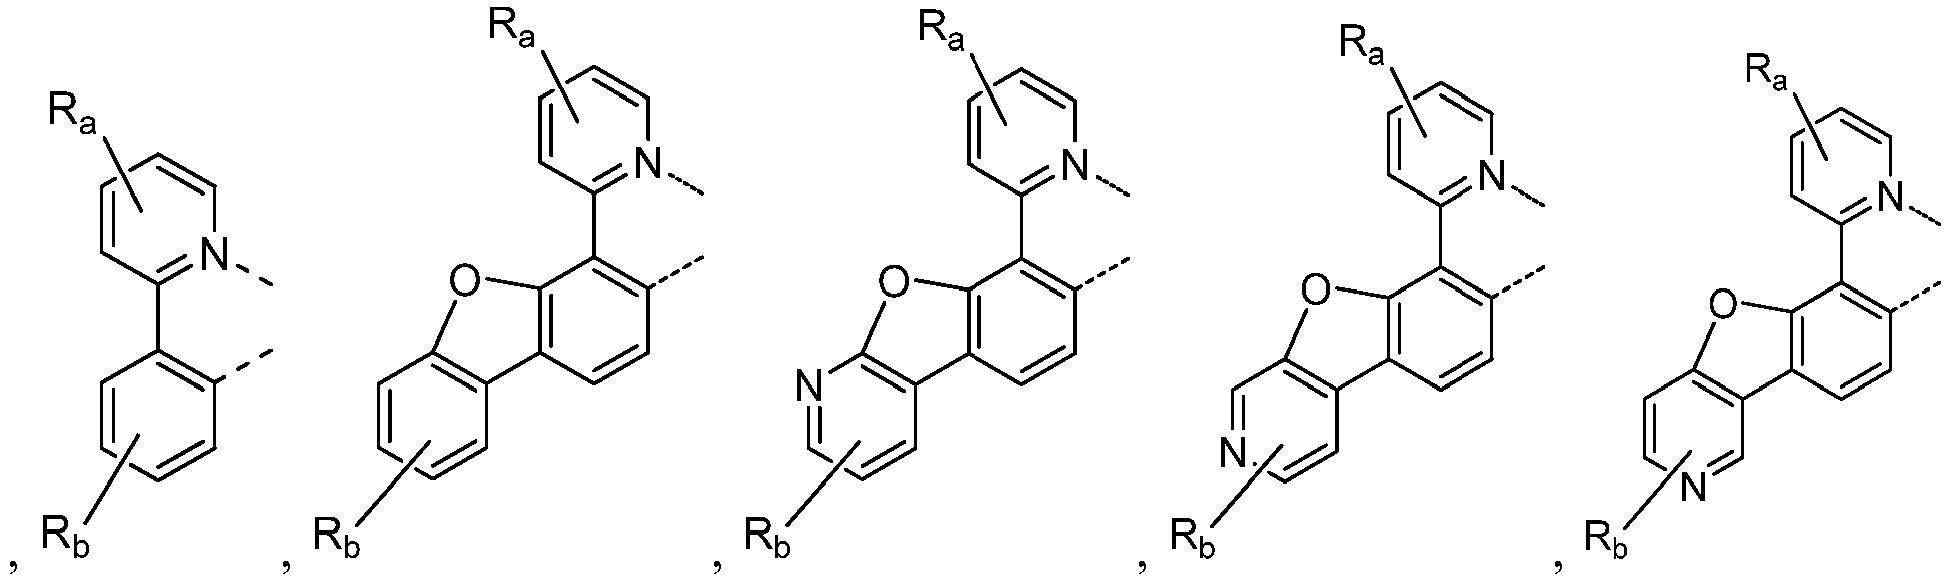 Figure imgb0787